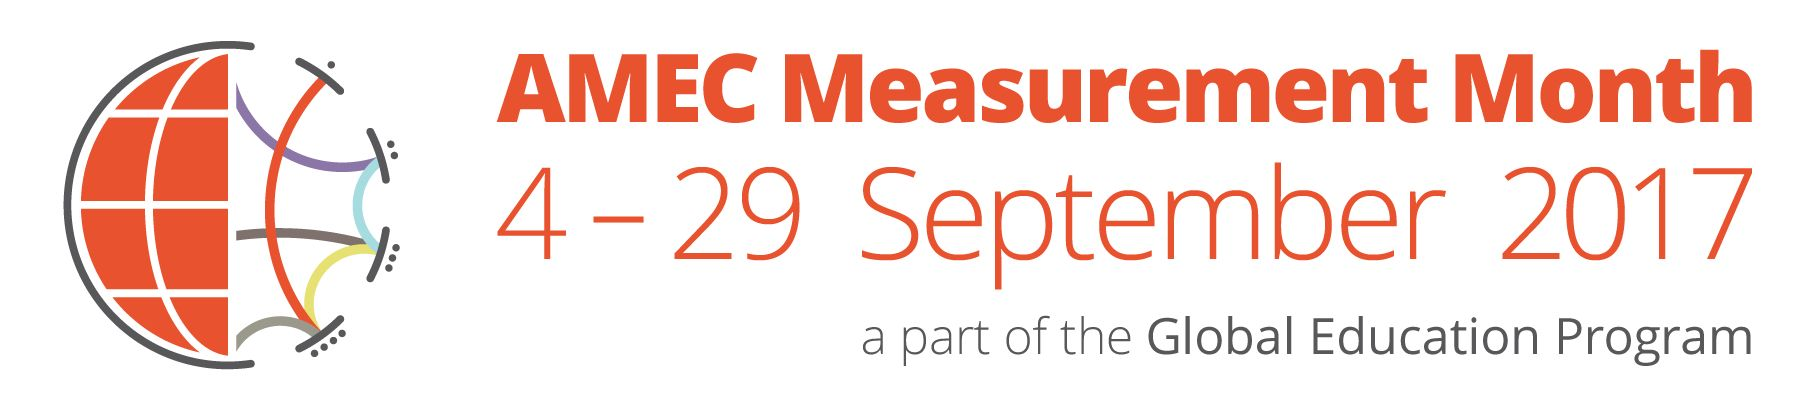 AMEC Measurement Month Logo